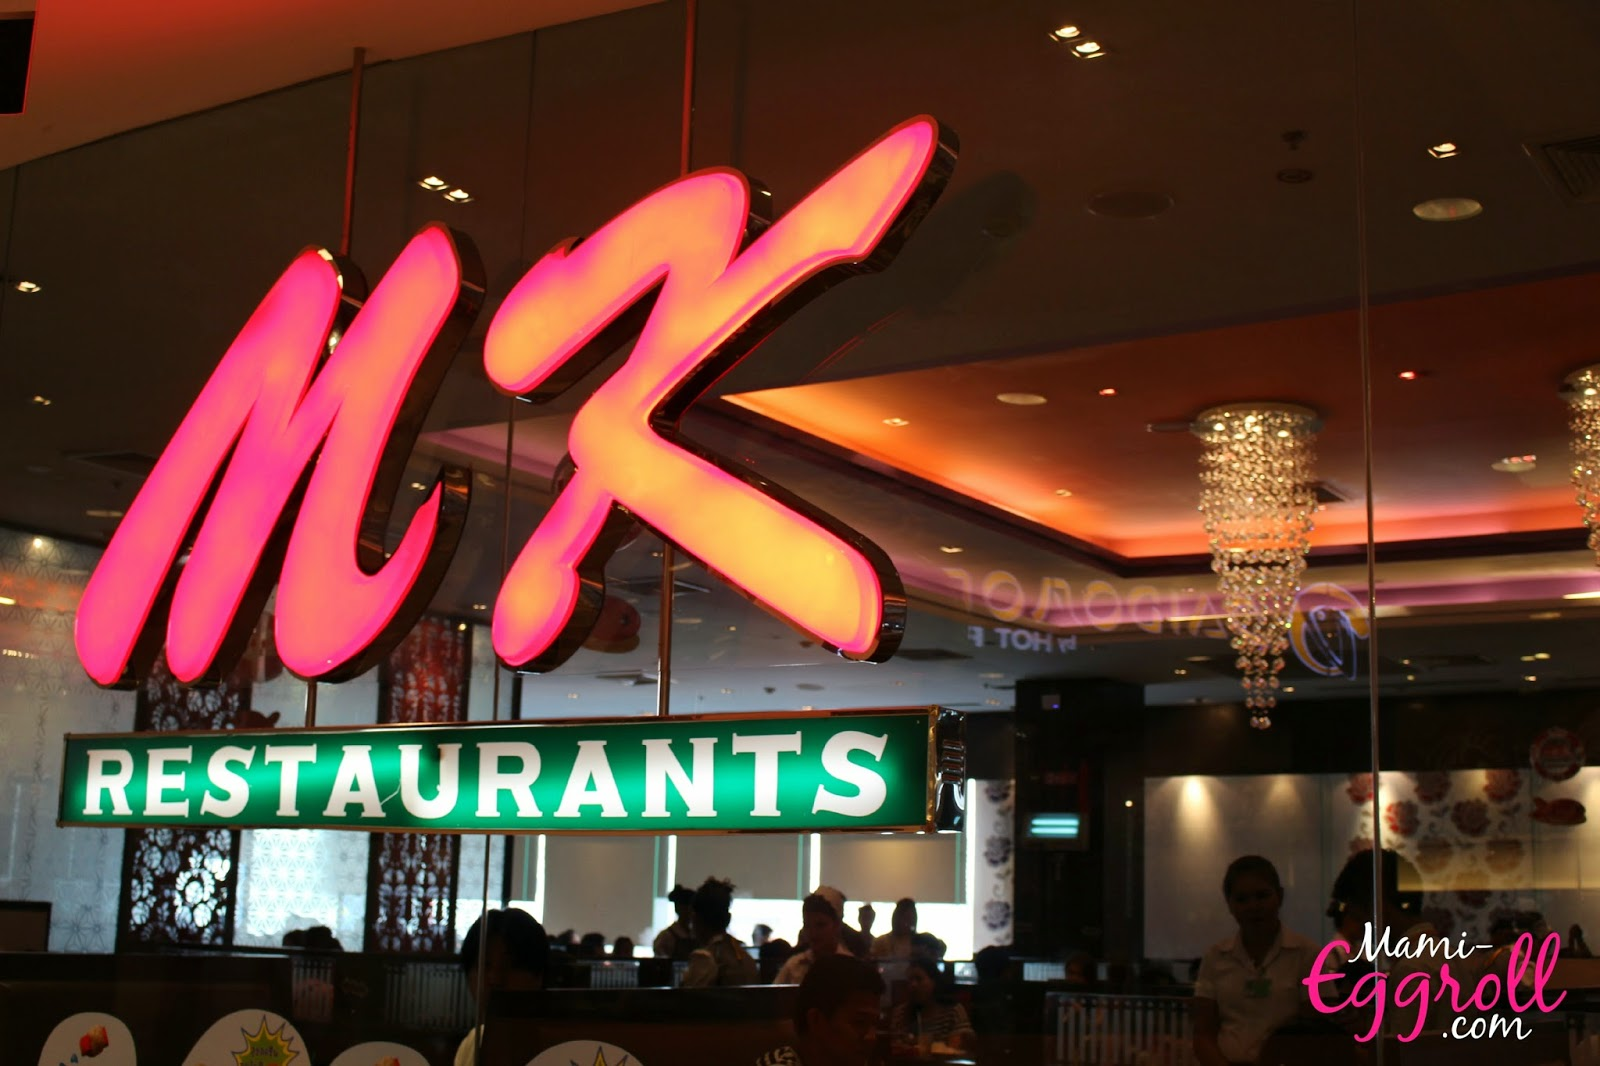 mk restaurant Menu for mk restaurant: reviews and photos of bison, cake & shake, duck.